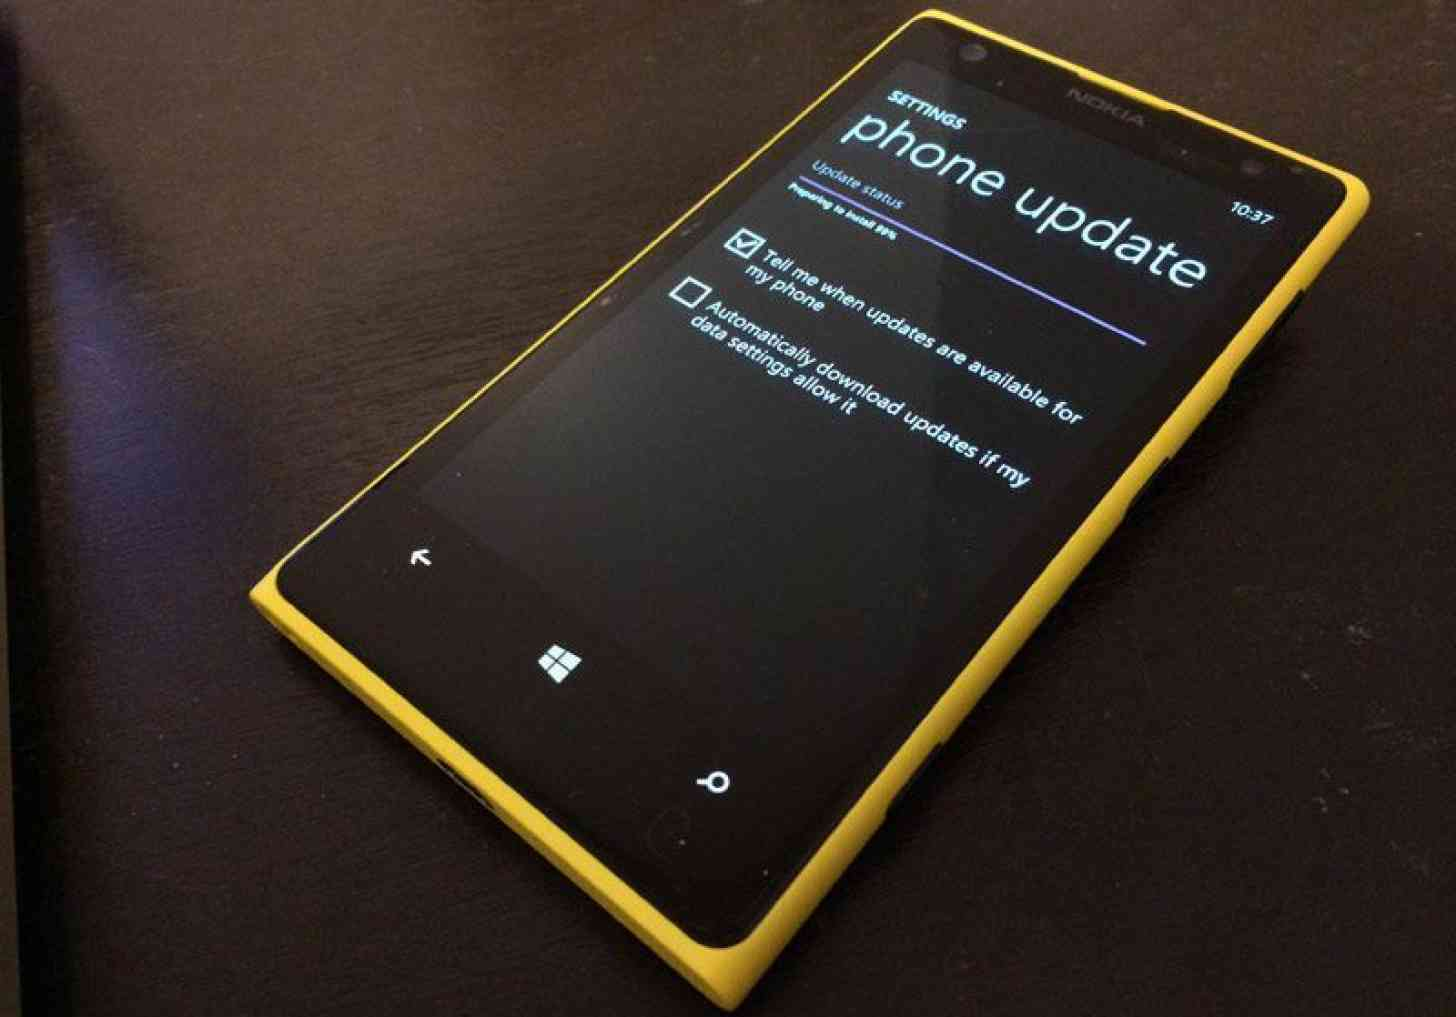 Nokia Lumia 1020 Phone Update